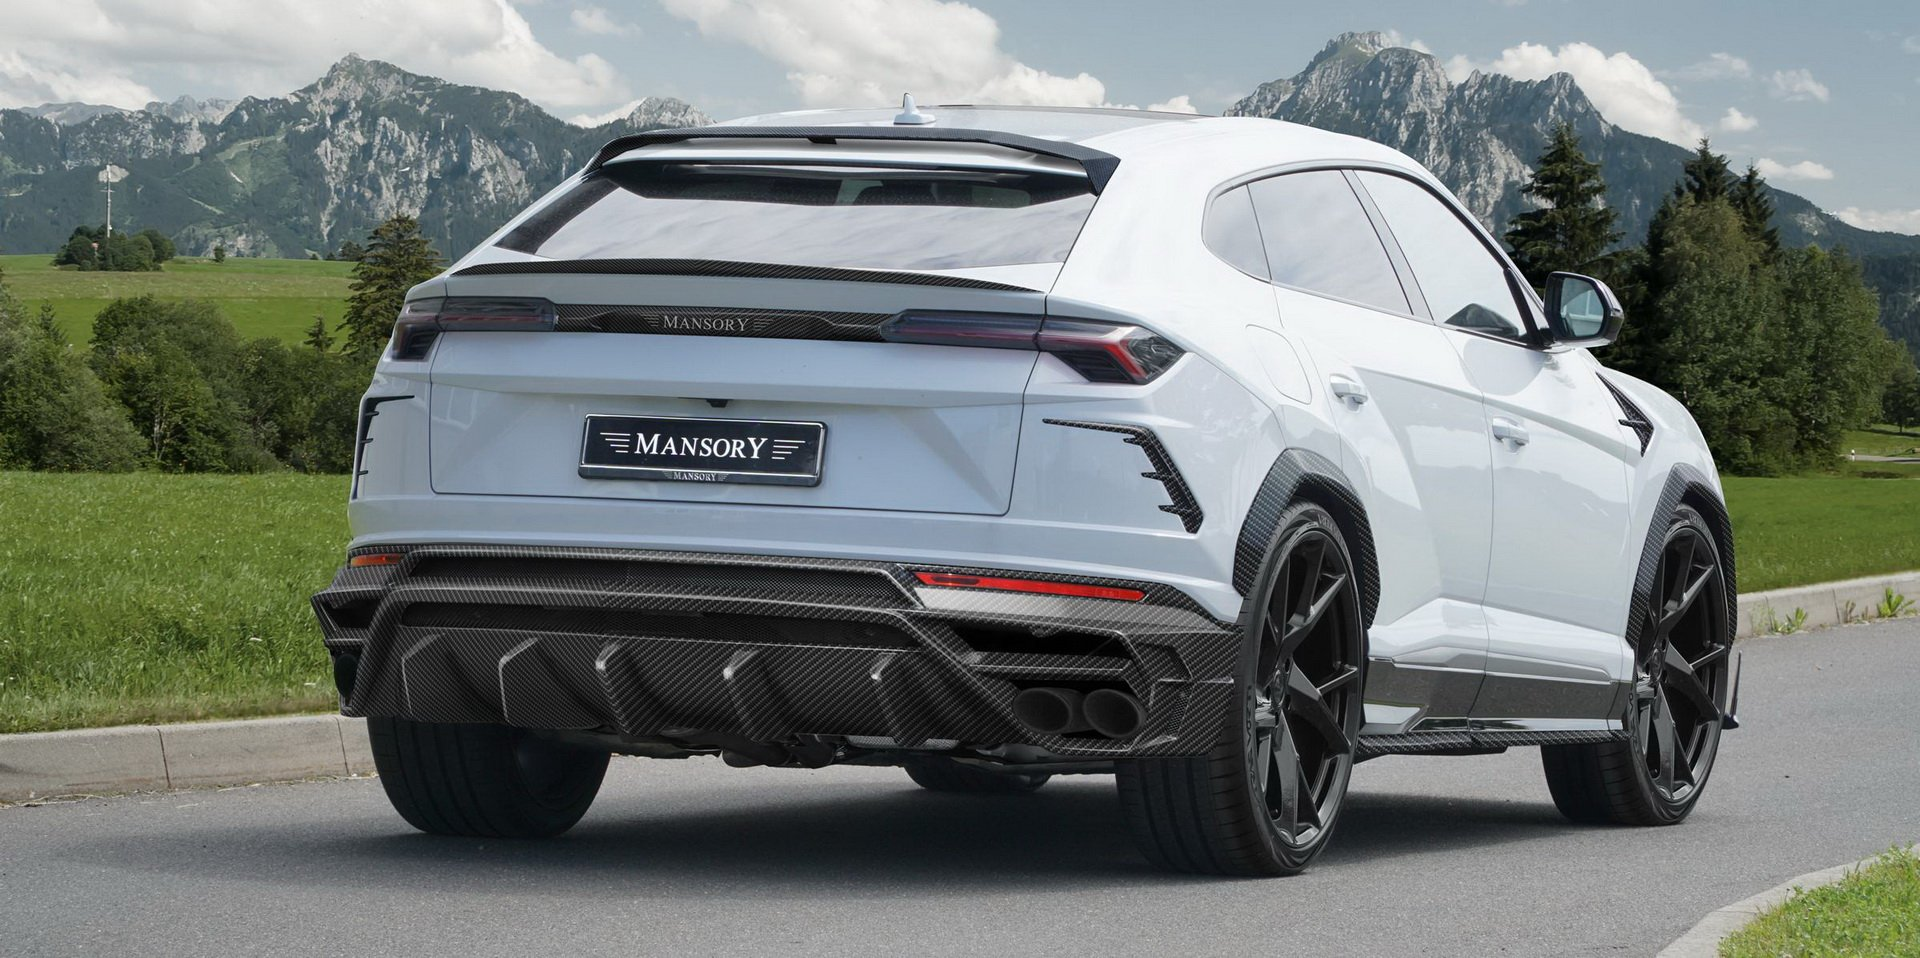 Lamborghini-Urus-by-Urus-2